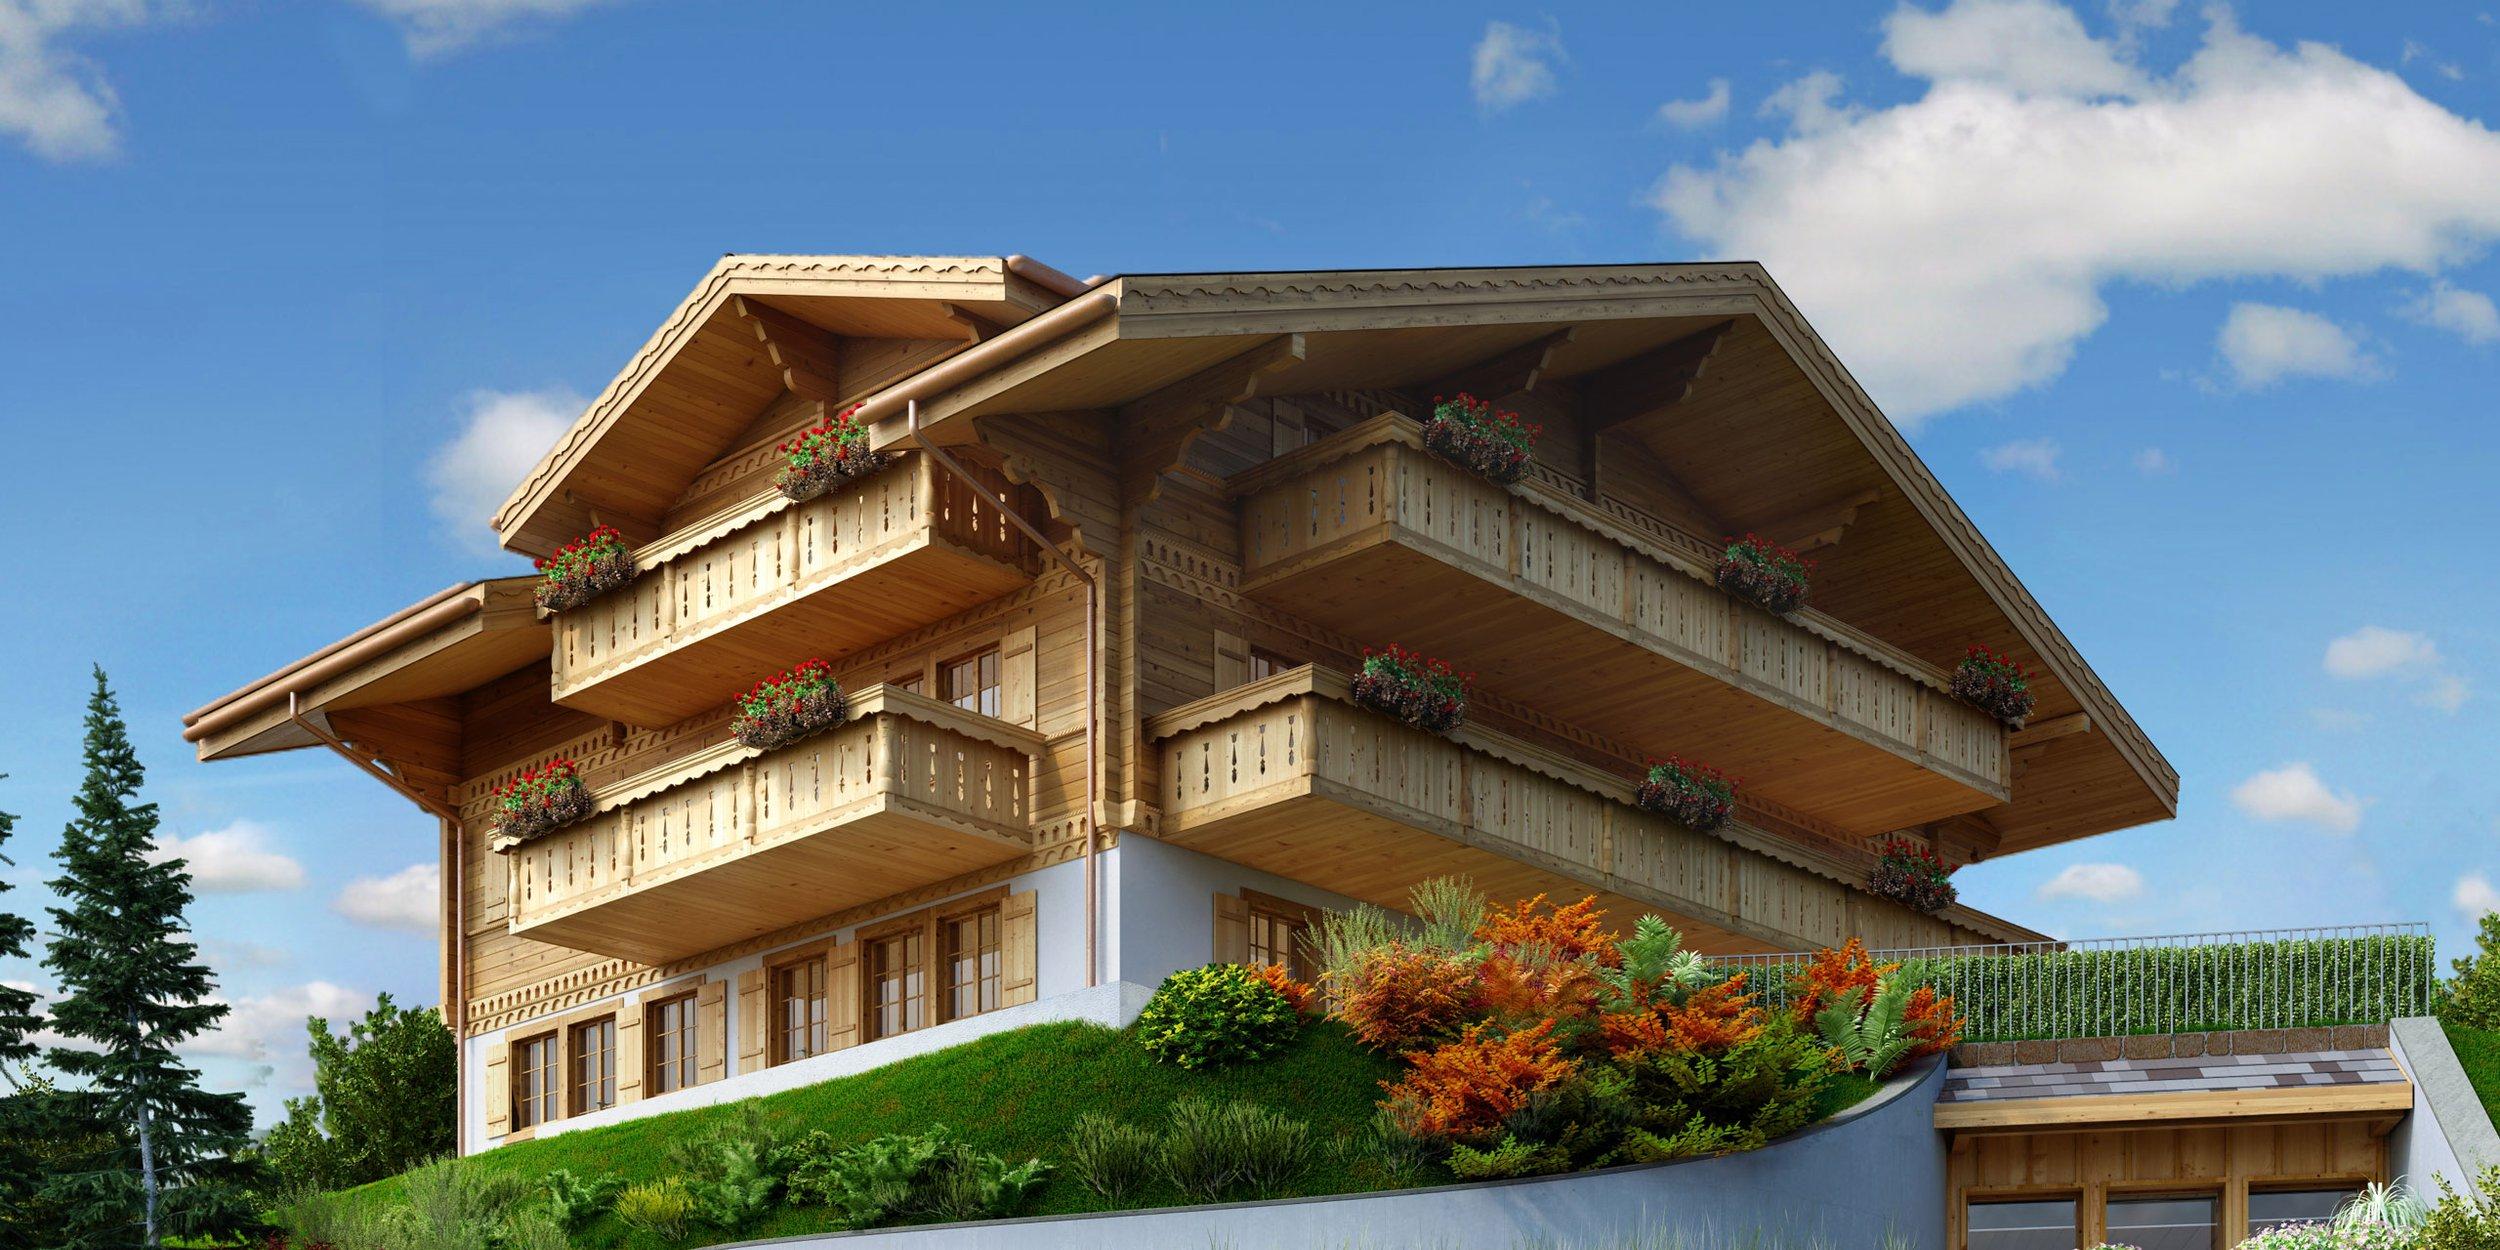 Hauswirth rchitekten - Property o Buy Gstaad Switzerland size: 2500 x 1250 post ID: 6 File size: 0 B